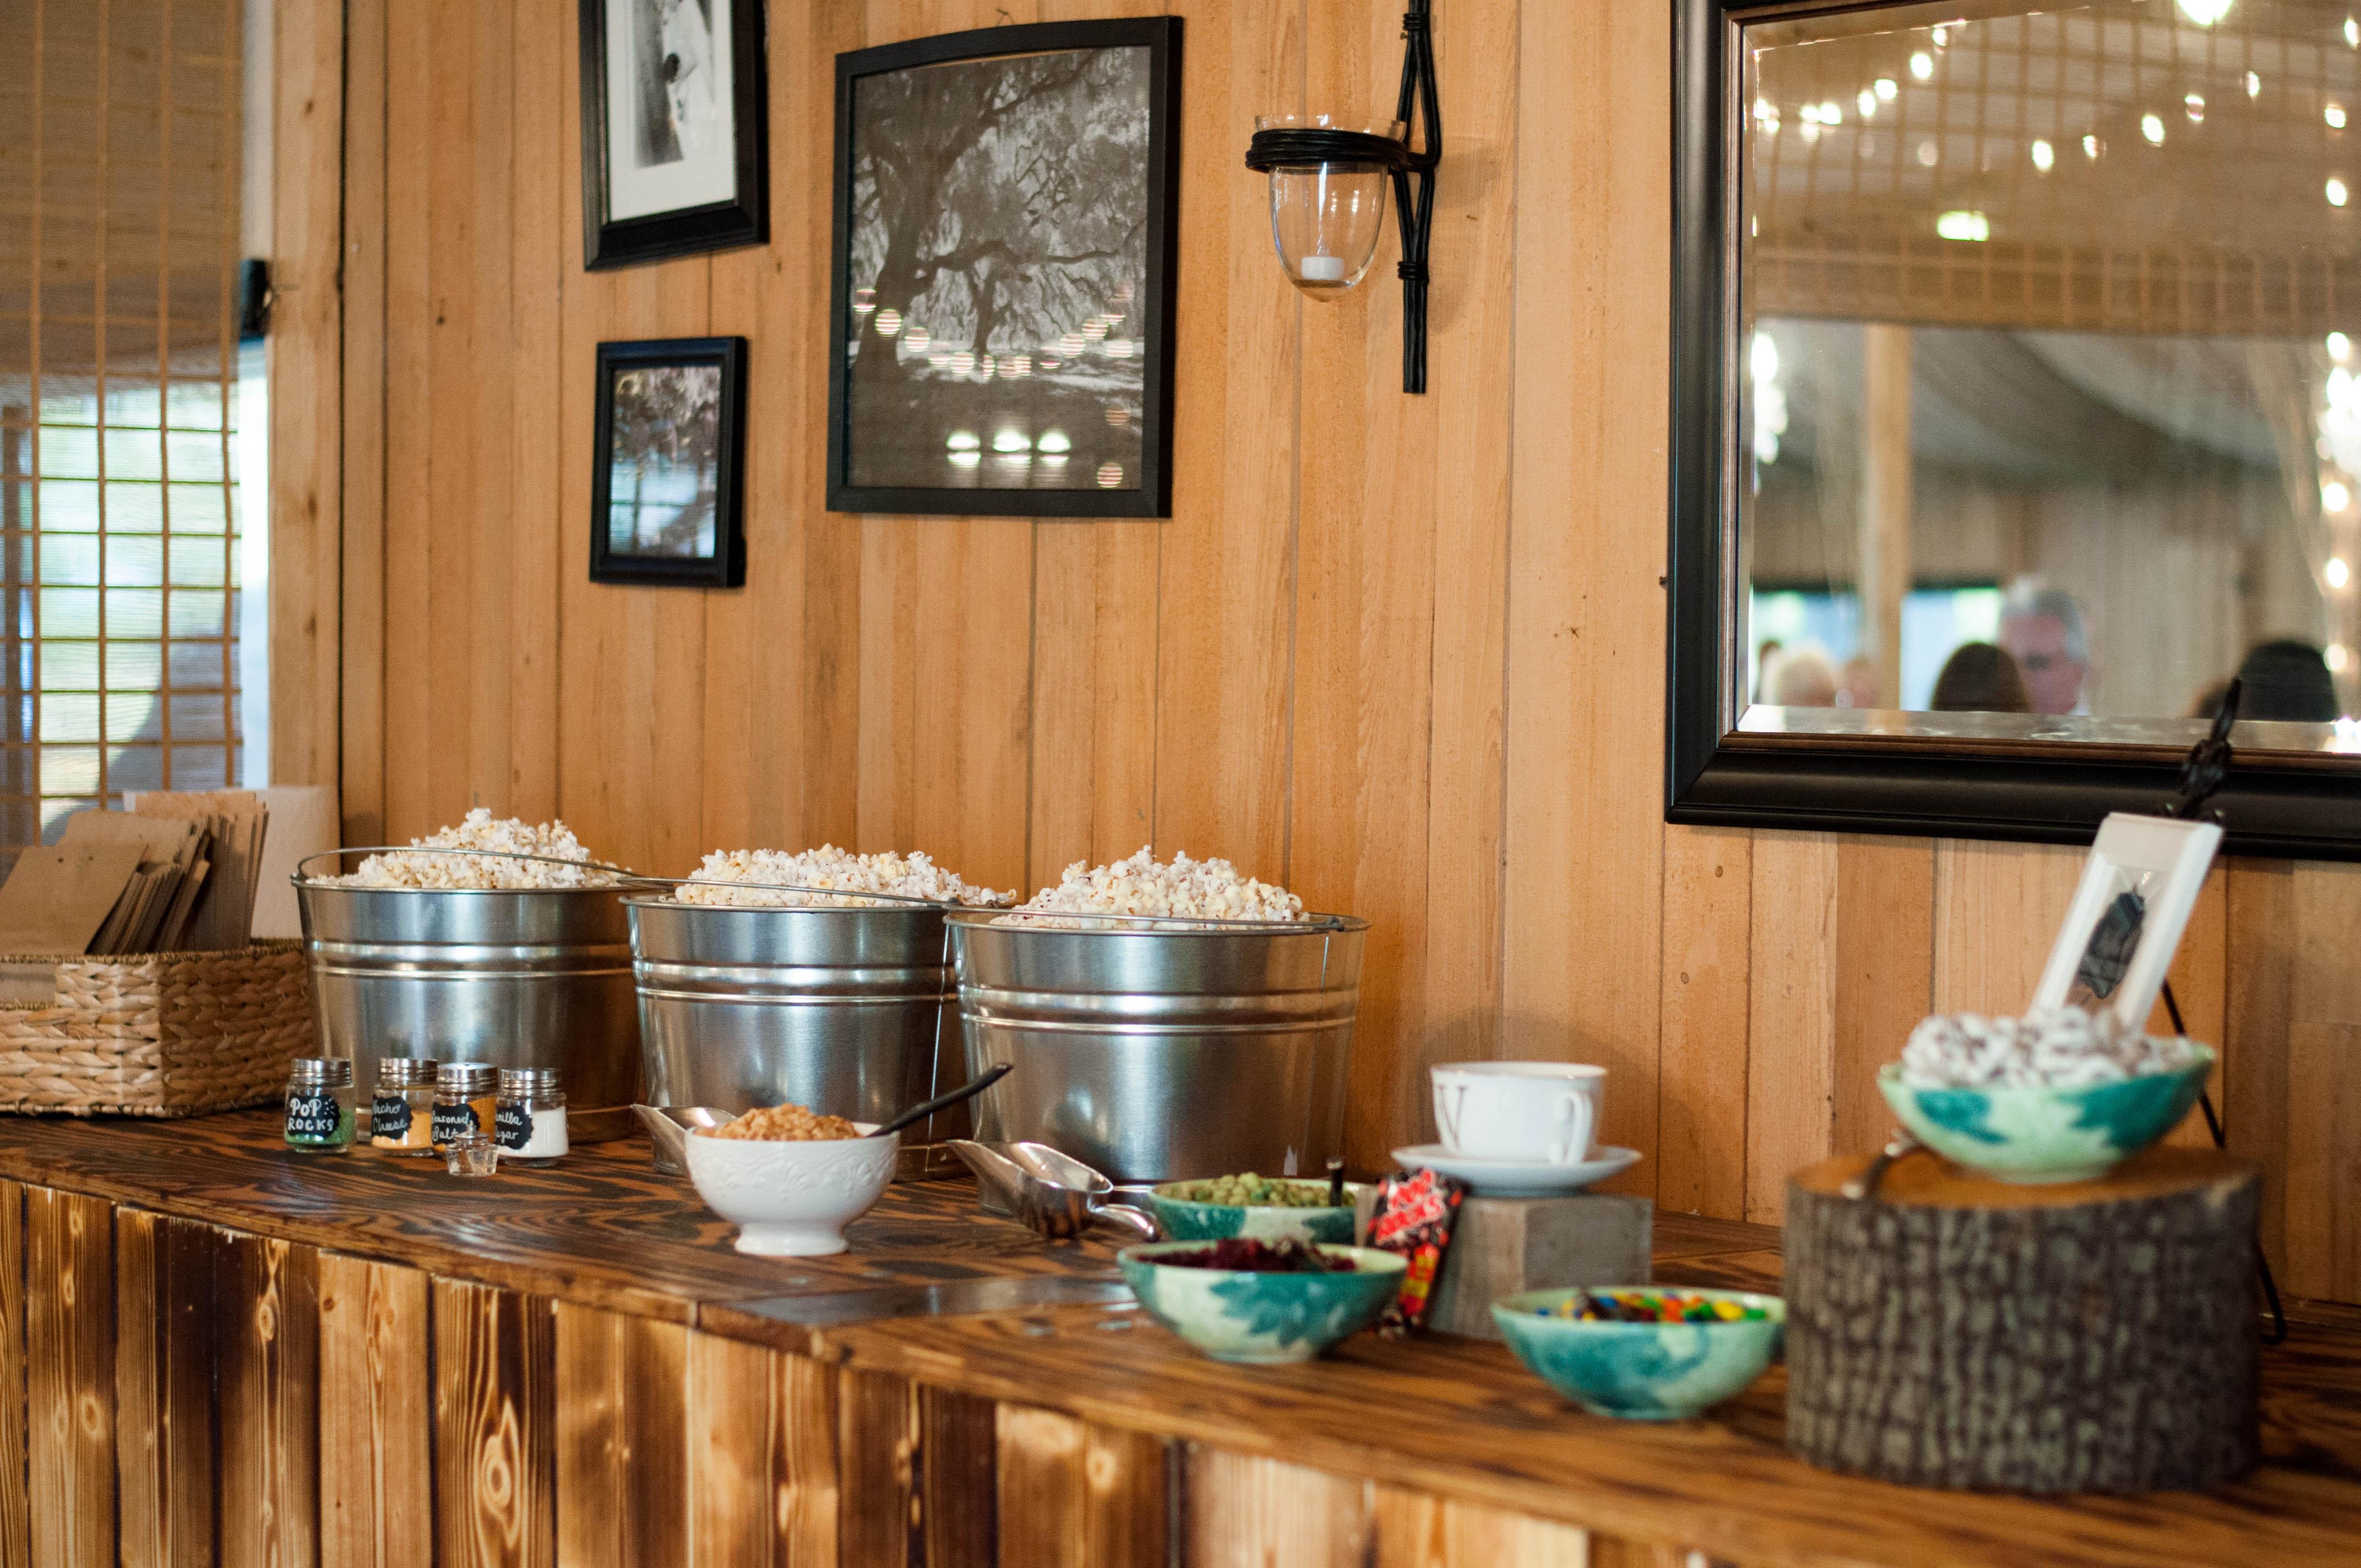 My Wedding  DIY  Anthro vibe  Classy Rustic  Navy Mint Coral  Bright Meadows Blog